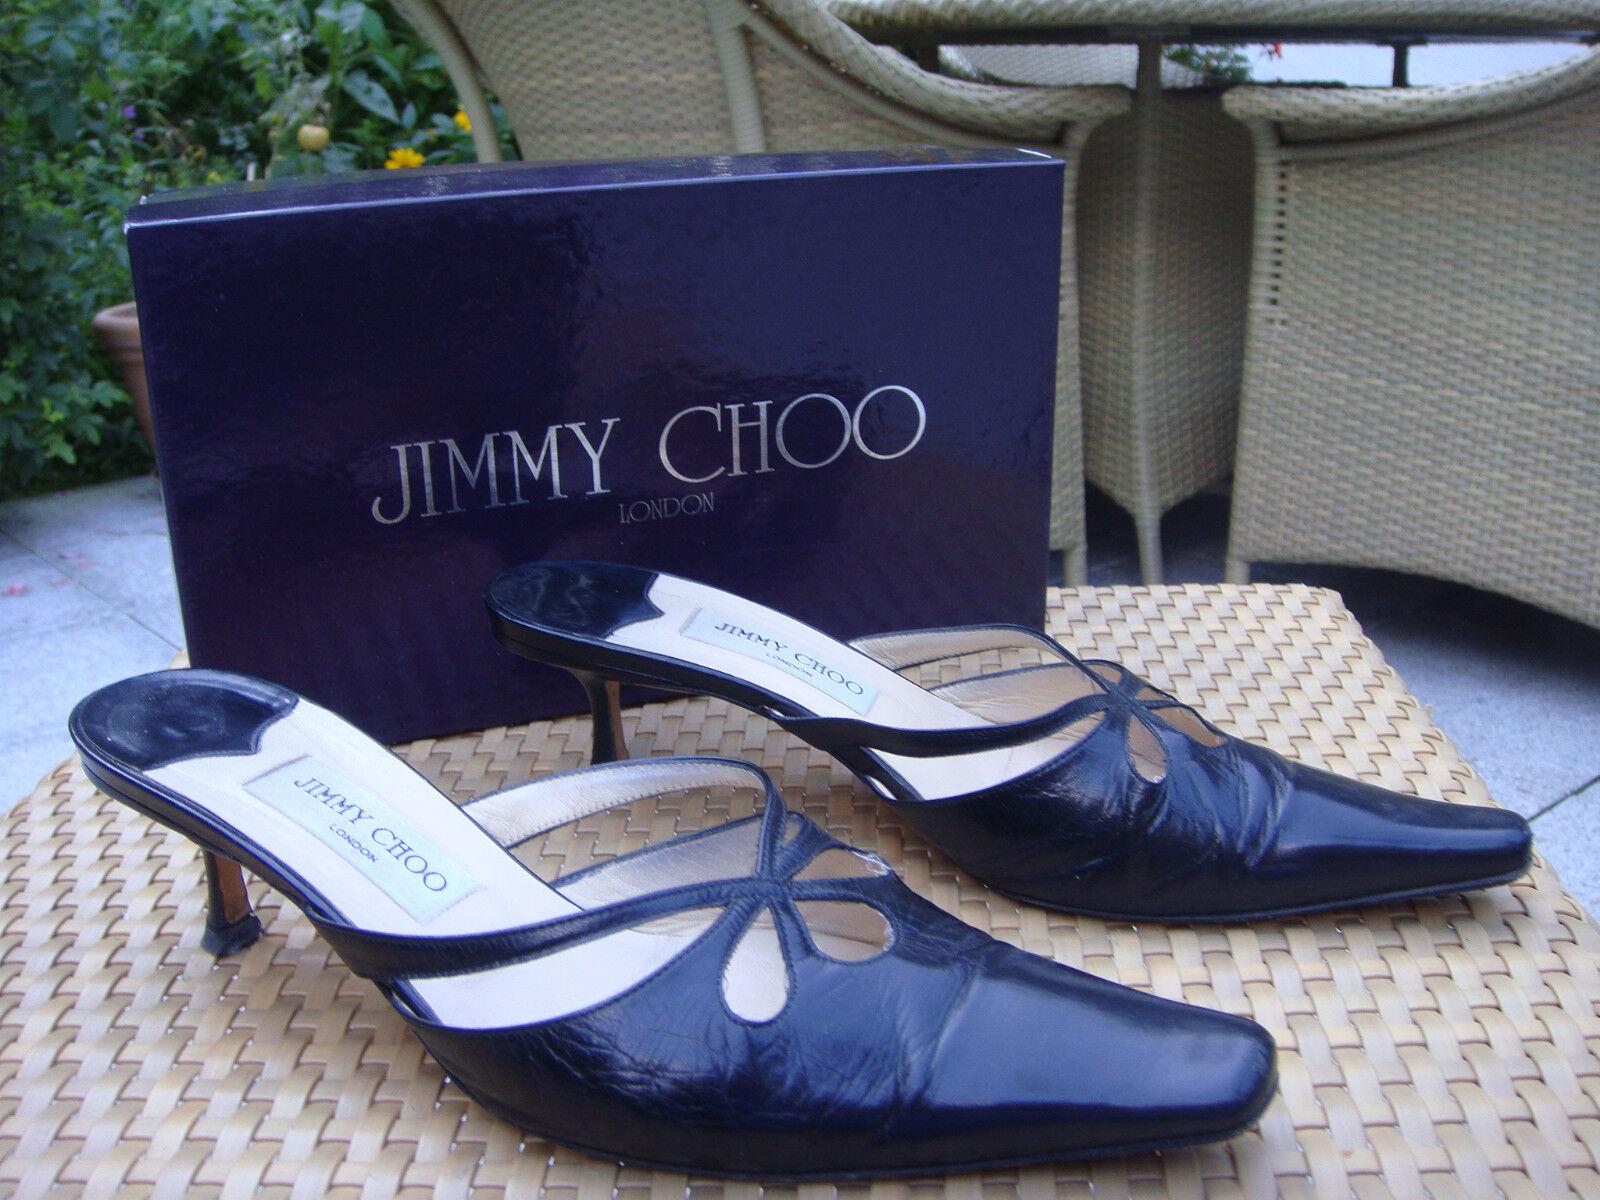 JIMMY CHOO LONDON Schuhe Slingbacks Gr.41 Schwarz